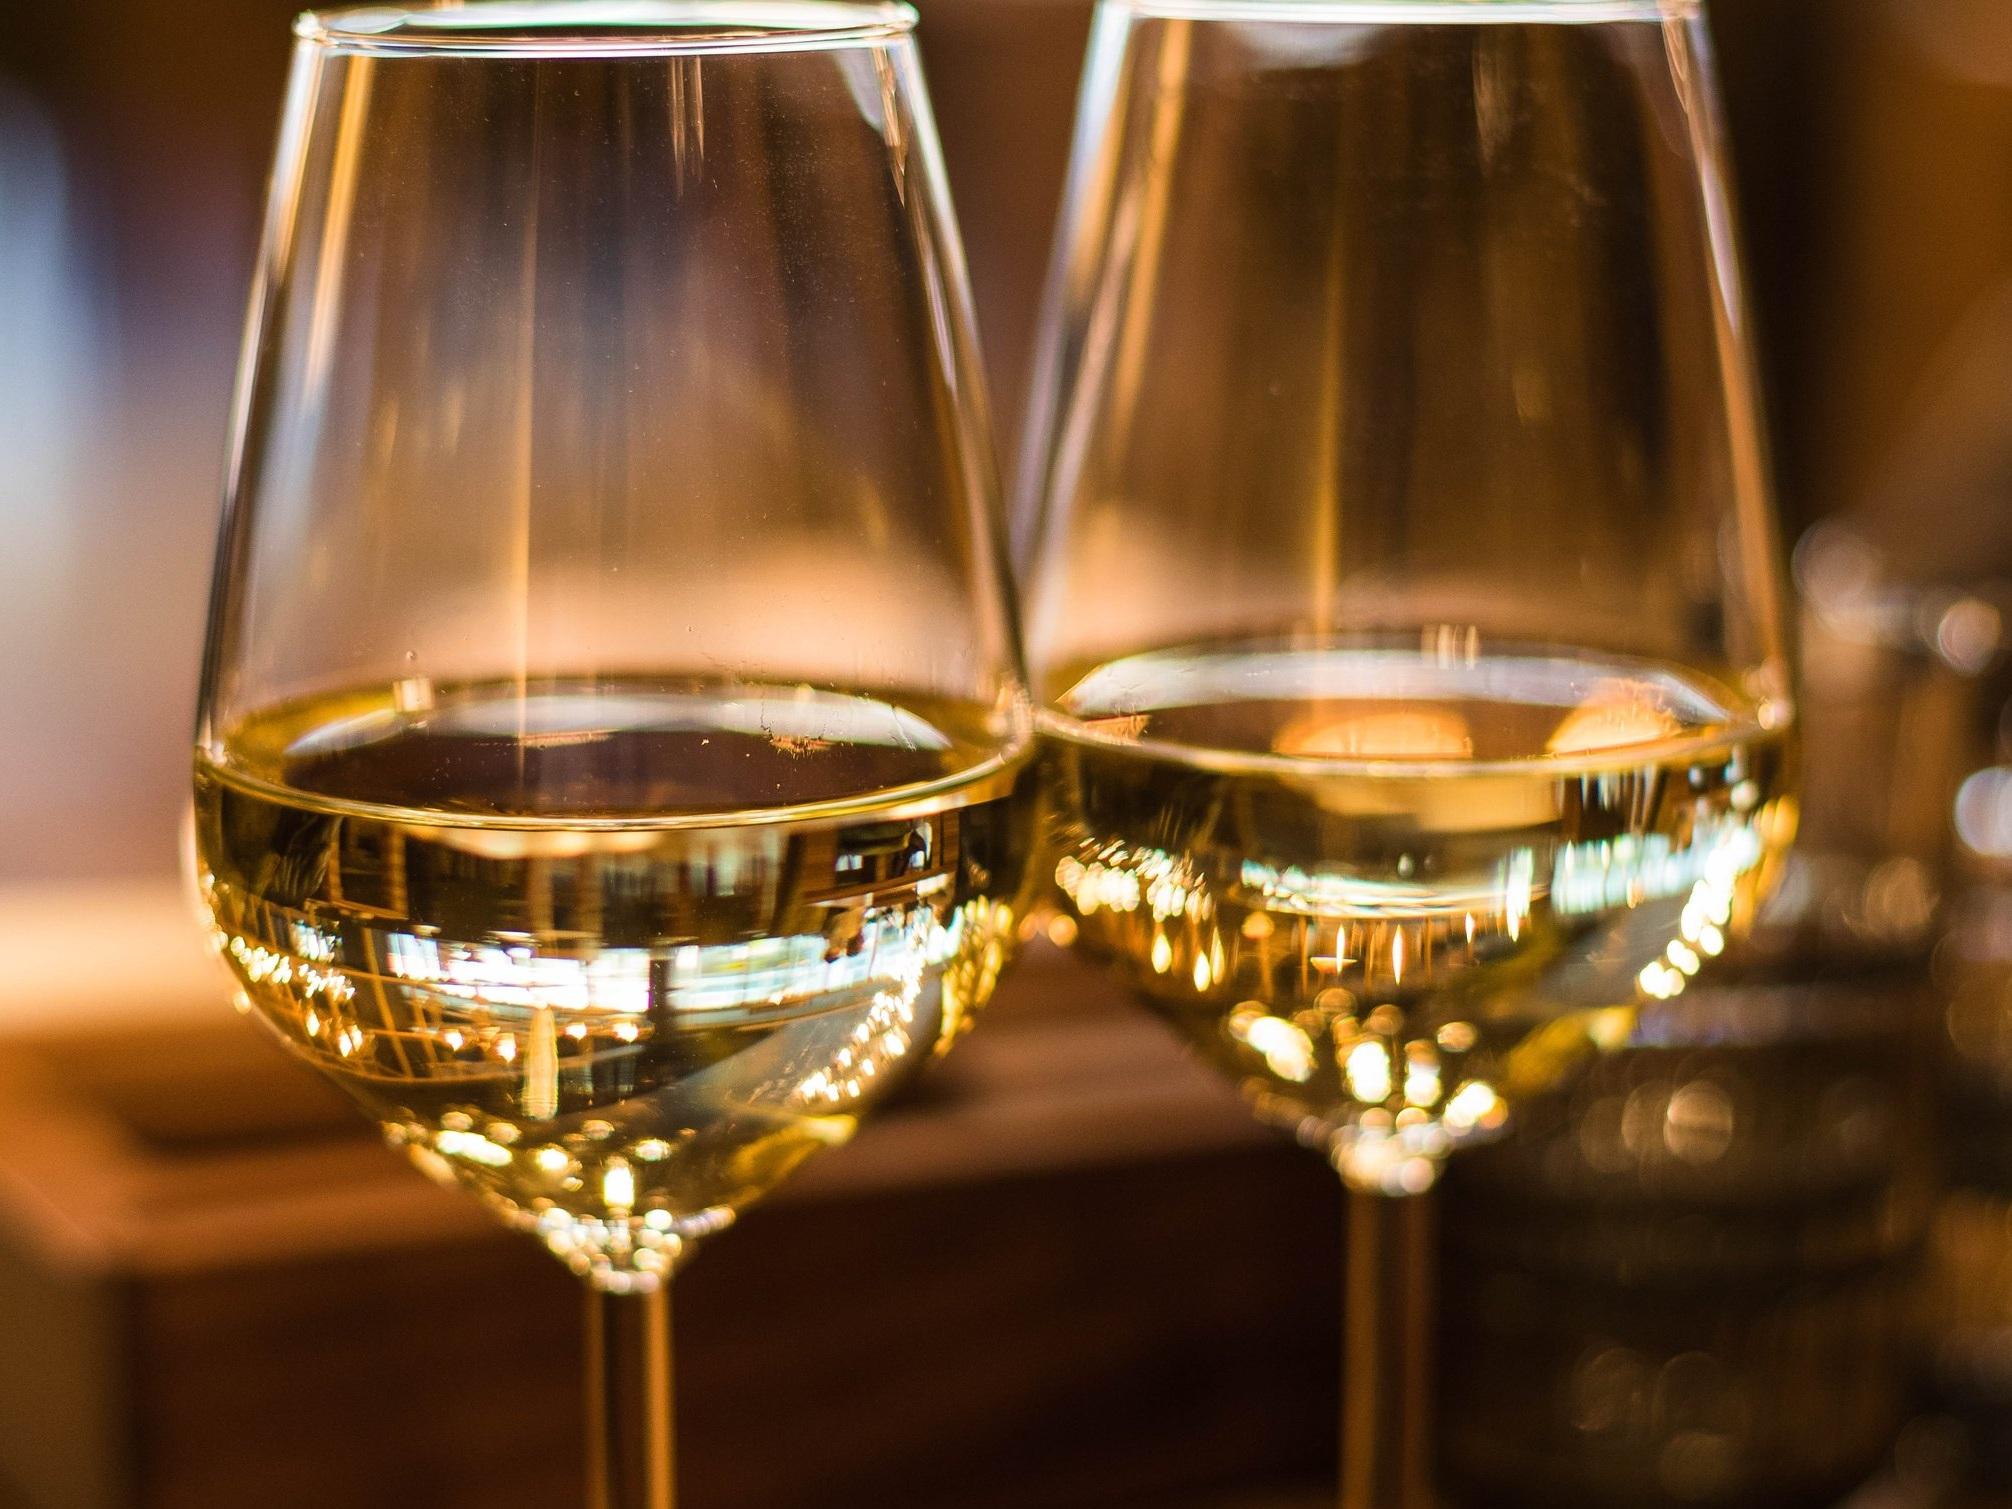 alcoholic-beverage-beverage-blur-1123260.jpg